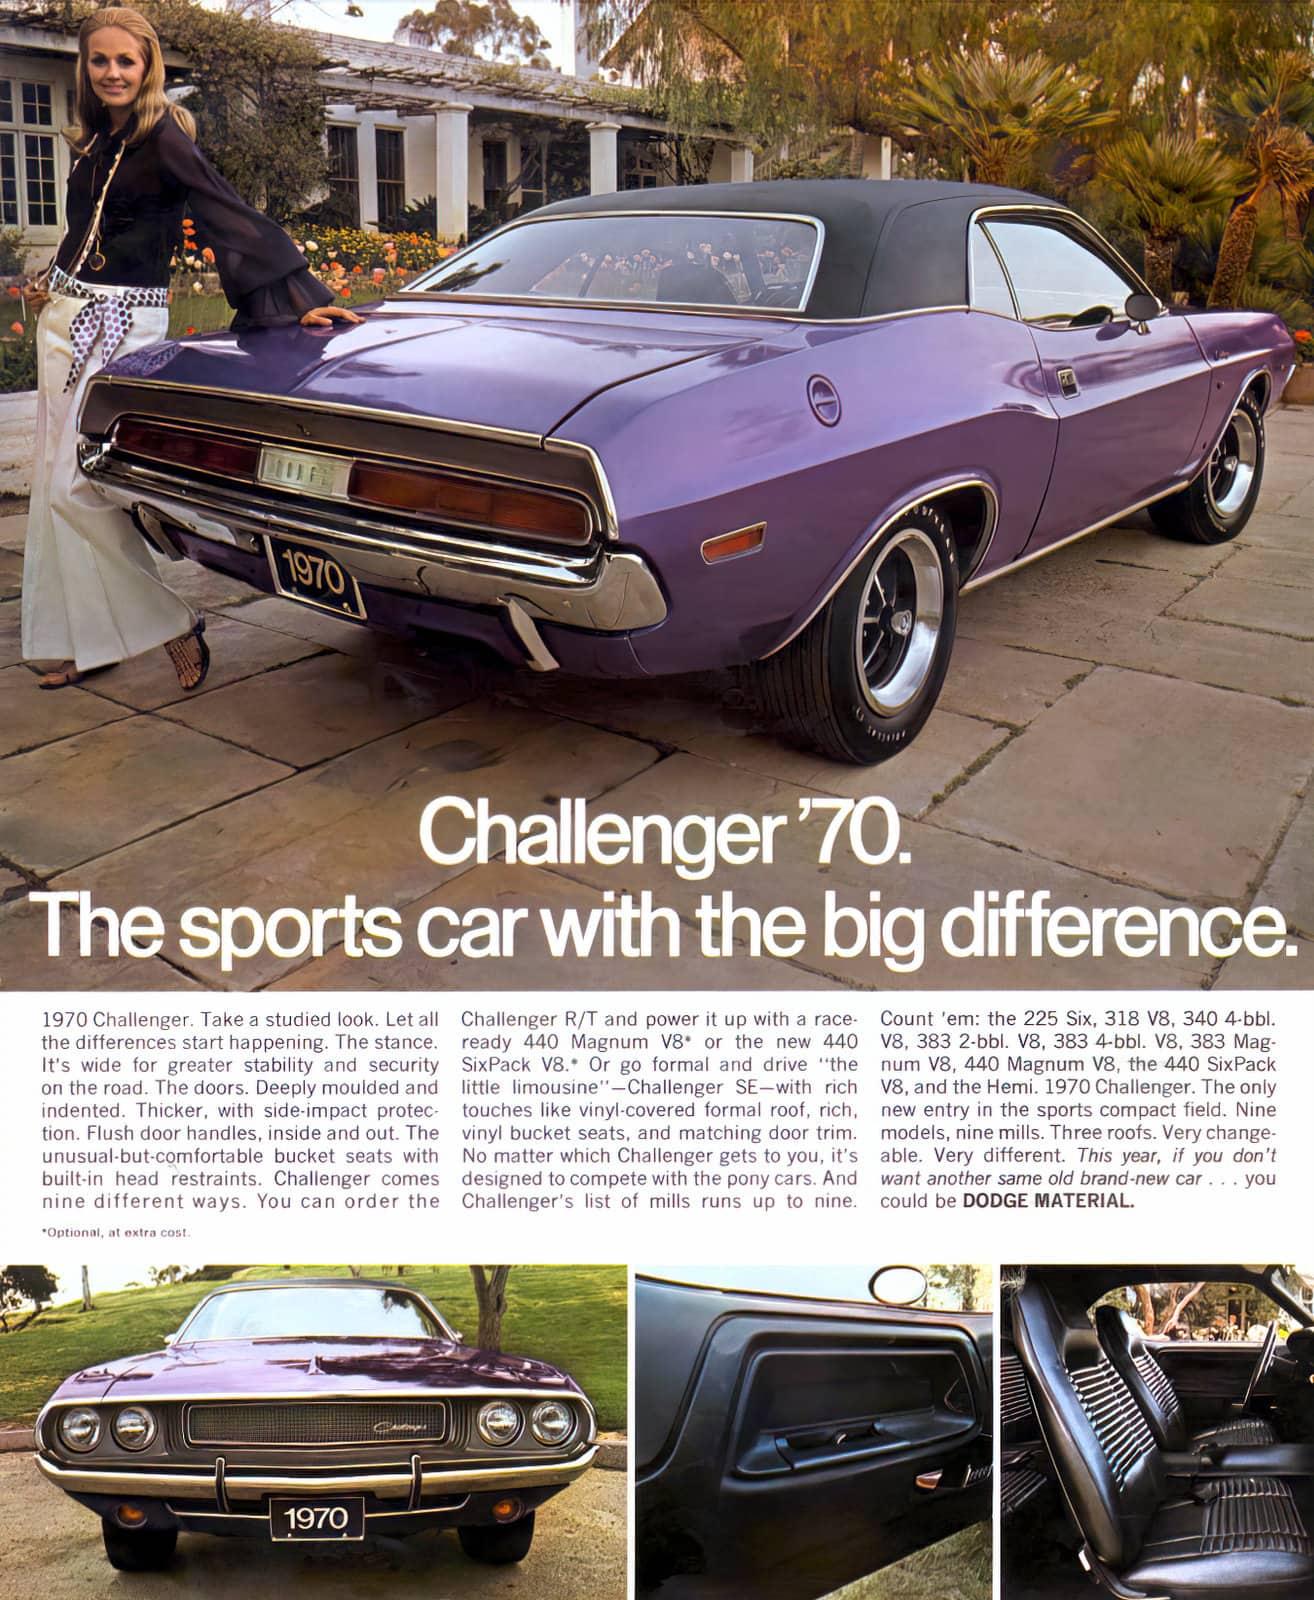 1970 Dodge Challenger sports car